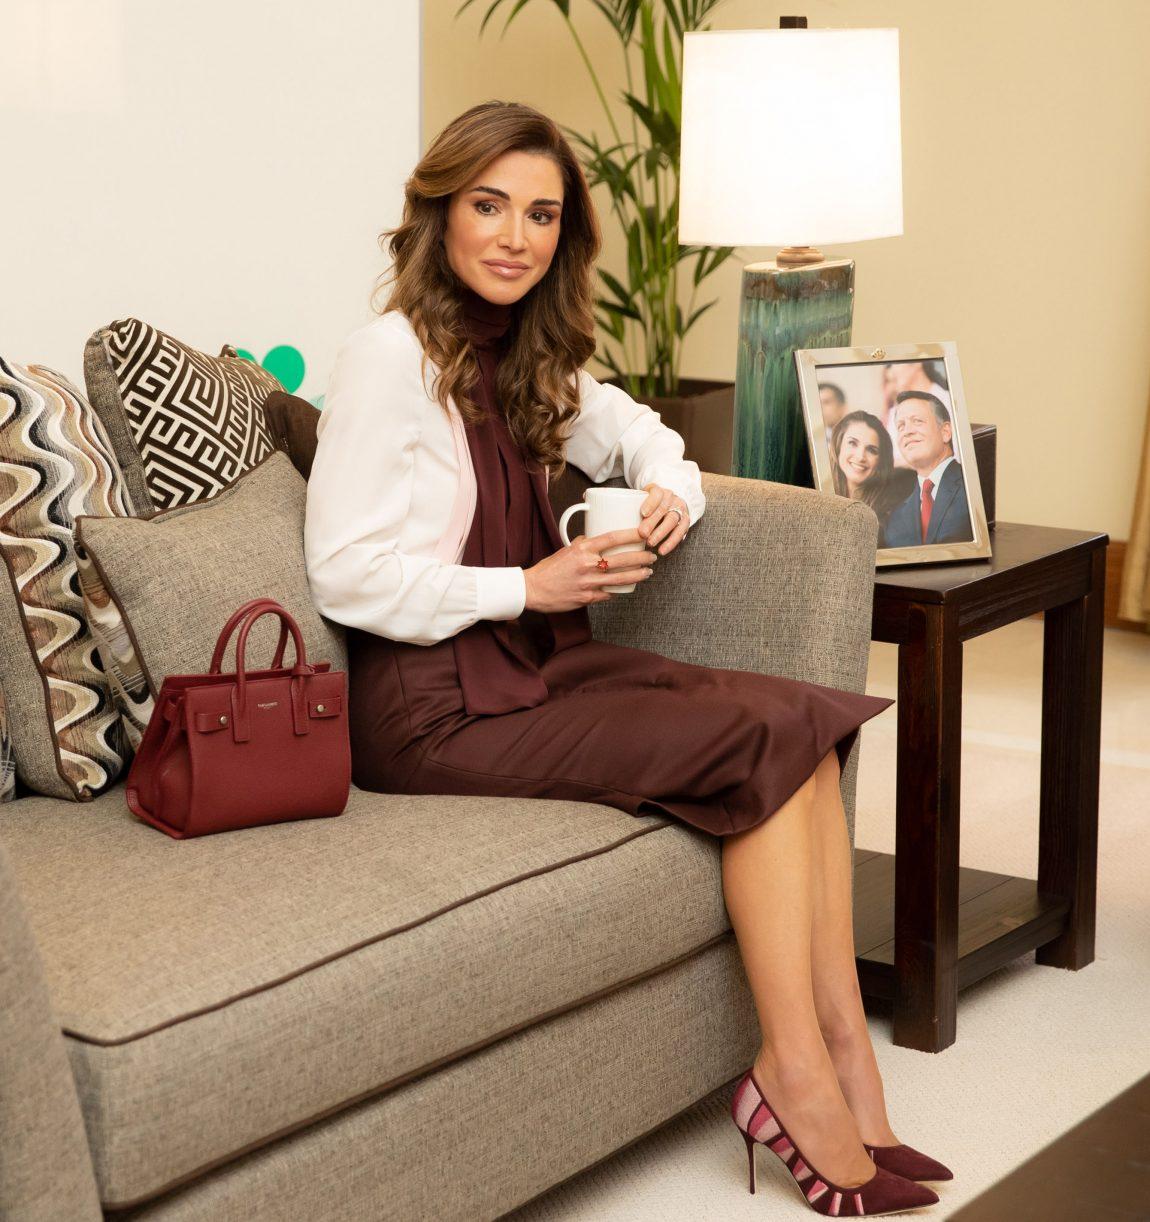 La Reine Rania Tres Feminine Lors D Un Grand Forum En Mer Morte Hola Maroc